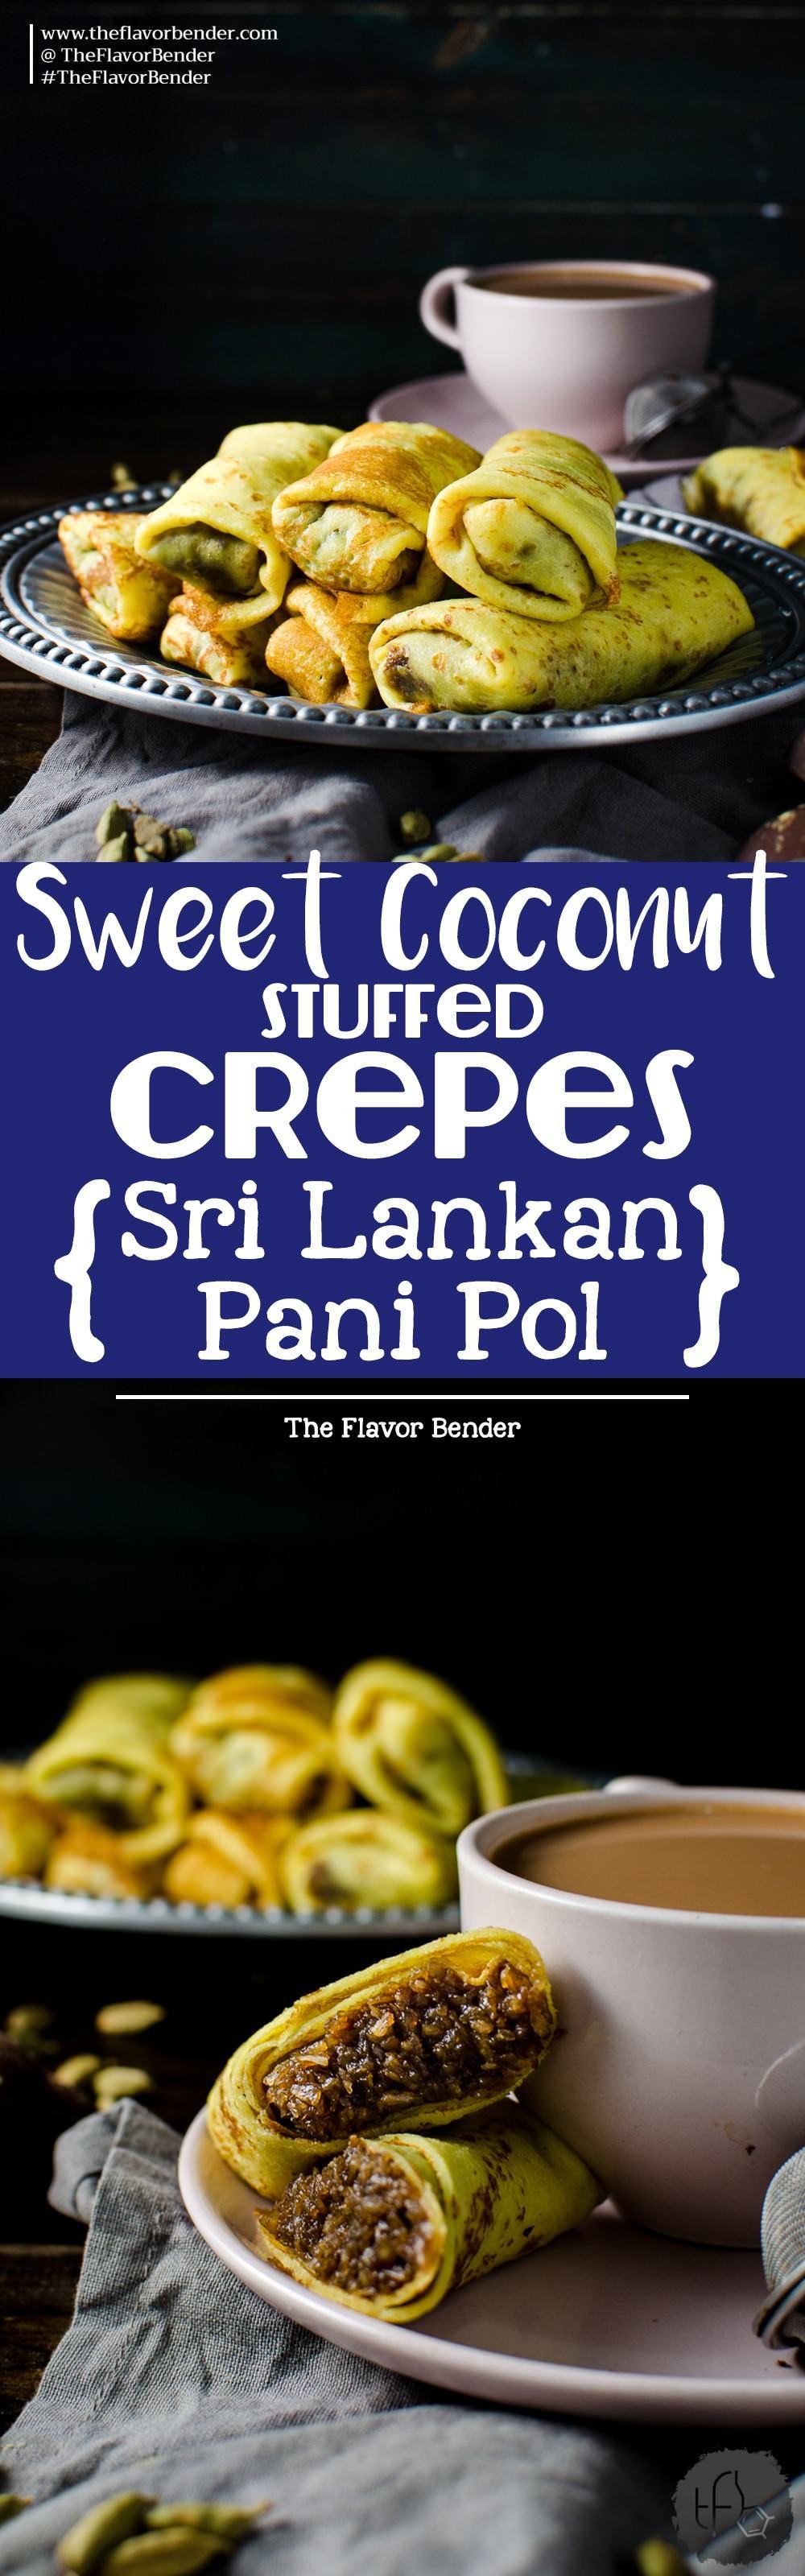 Sweet coconut stuffed Crepes - Pani Pol - A Sri Lankan classic sweet treat. Desserts | Crepes | Vegan friendly | Sweet treats | Coconut